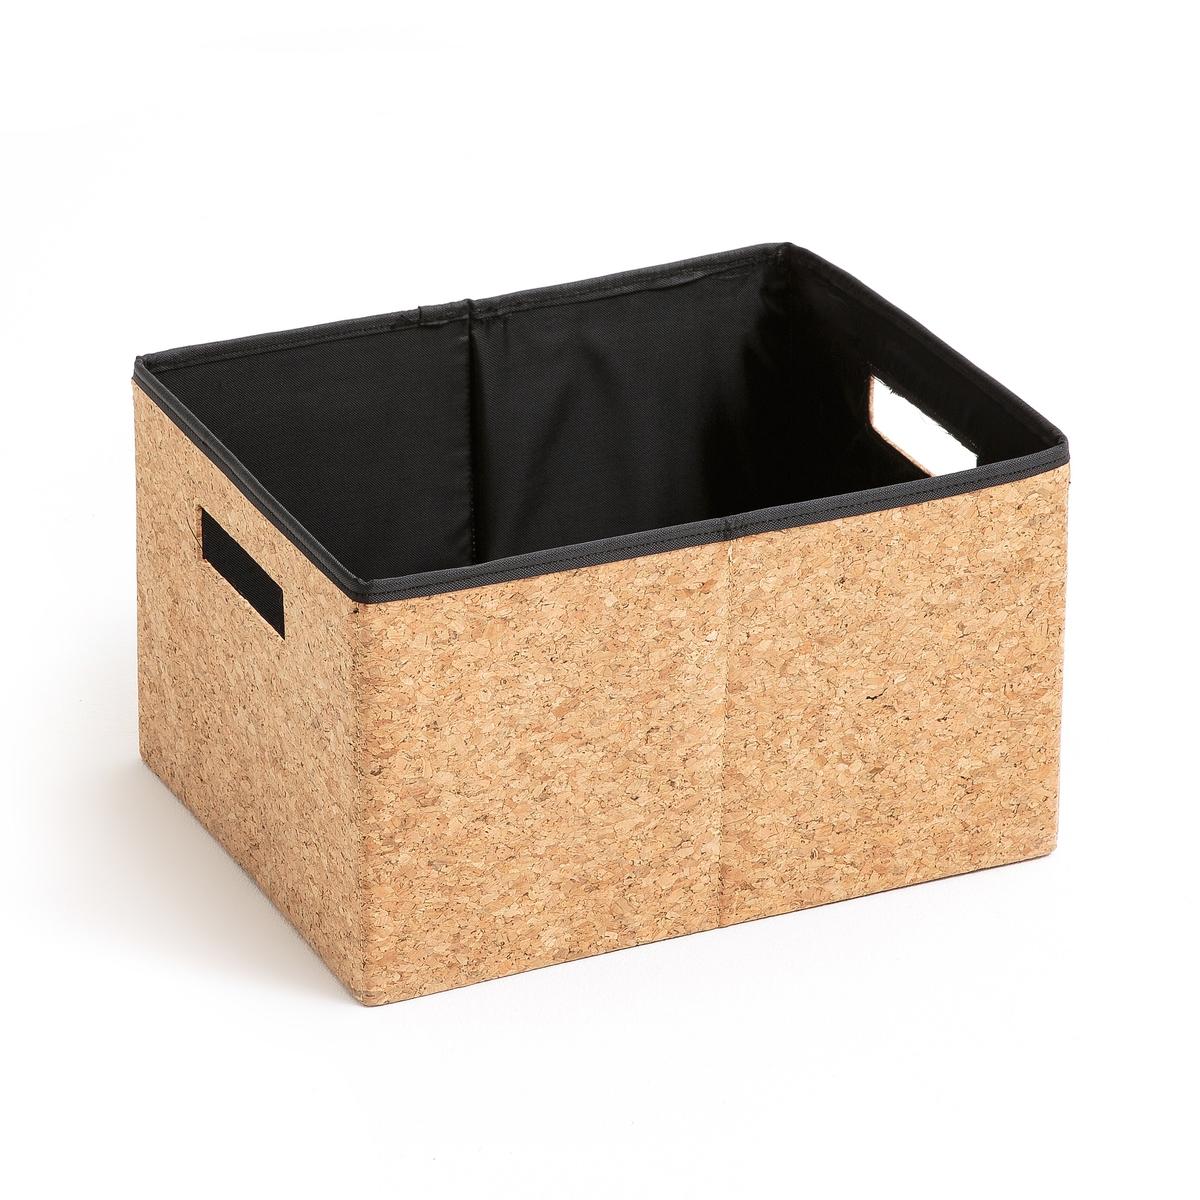 Коробка для хранения из пробки, размер S